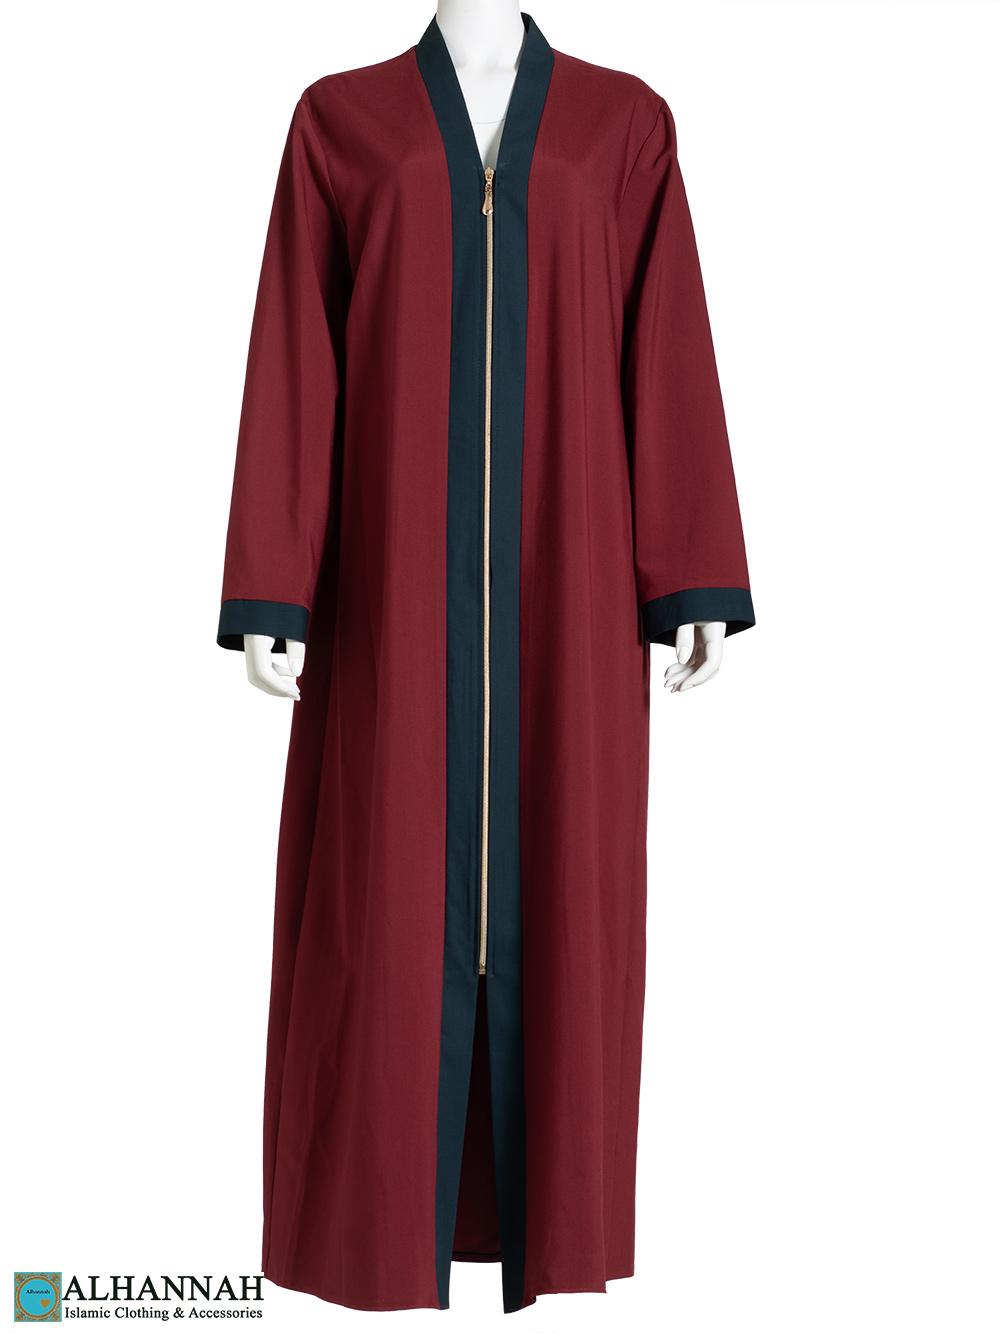 Black-Trim Red Abaya ab792